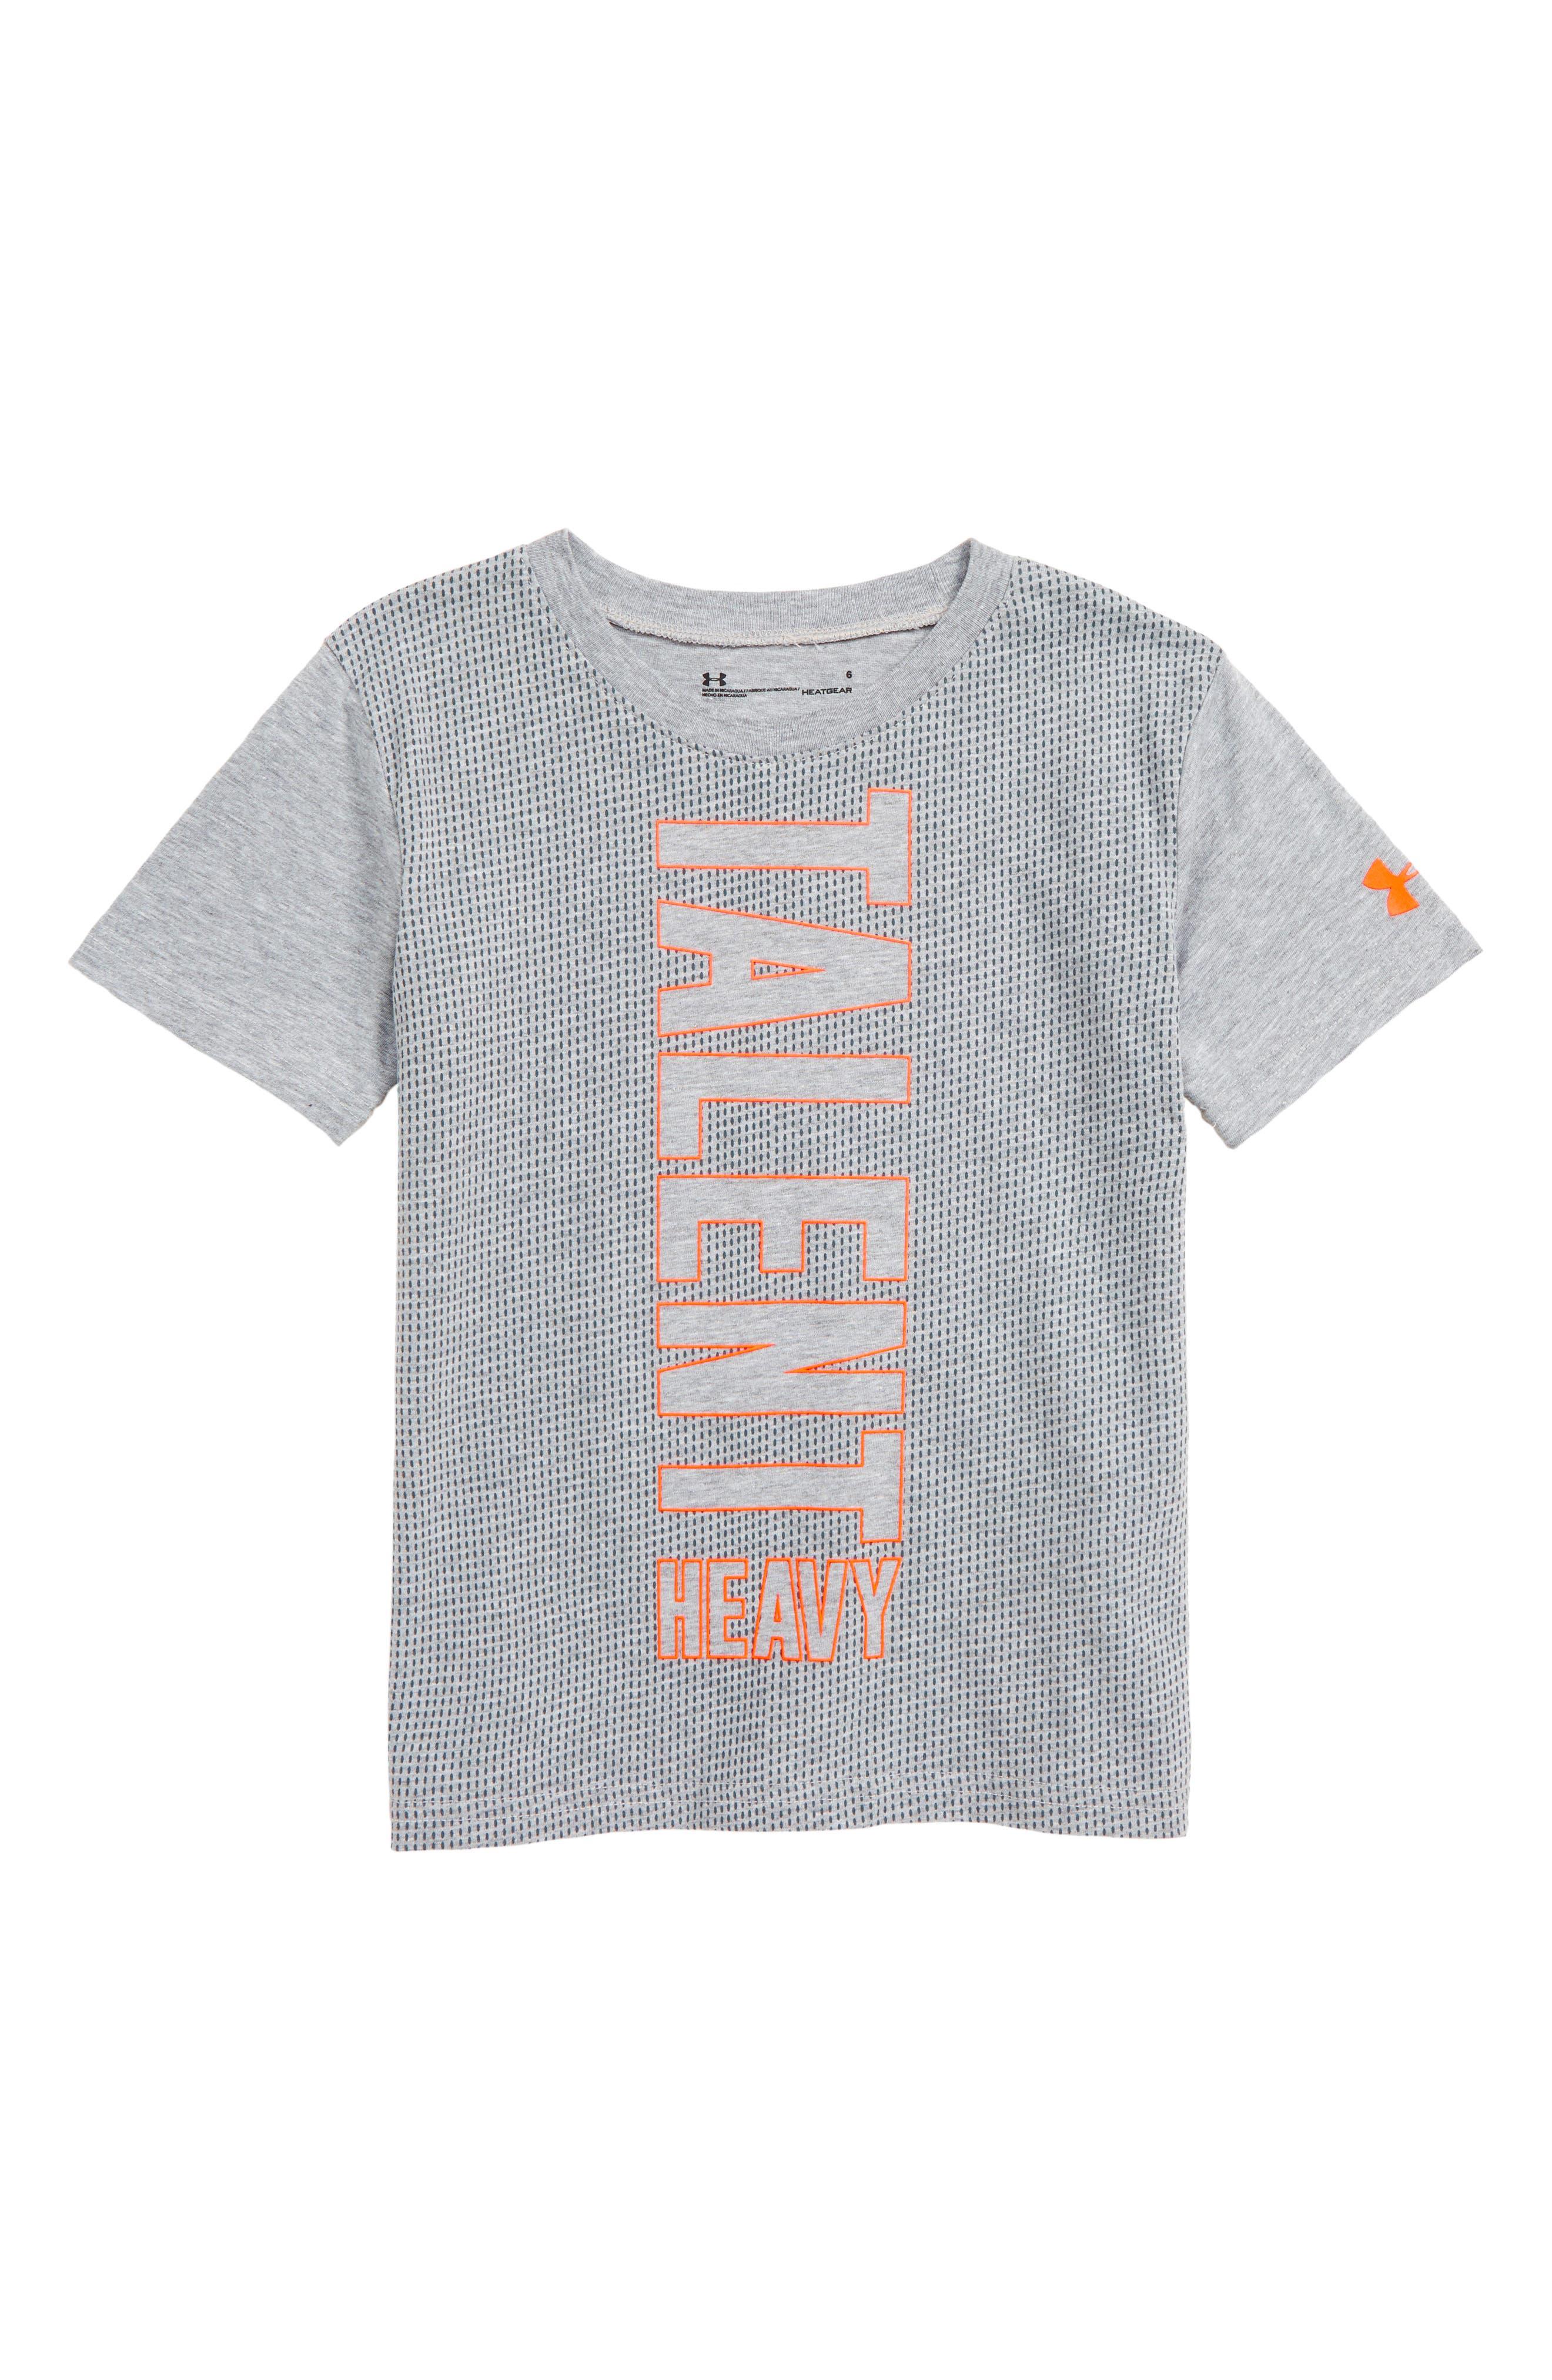 UNDER ARMOUR,                             Talent Heavy Twist HeatGear<sup>®</sup> T-Shirt,                             Main thumbnail 1, color,                             MOD GRAY